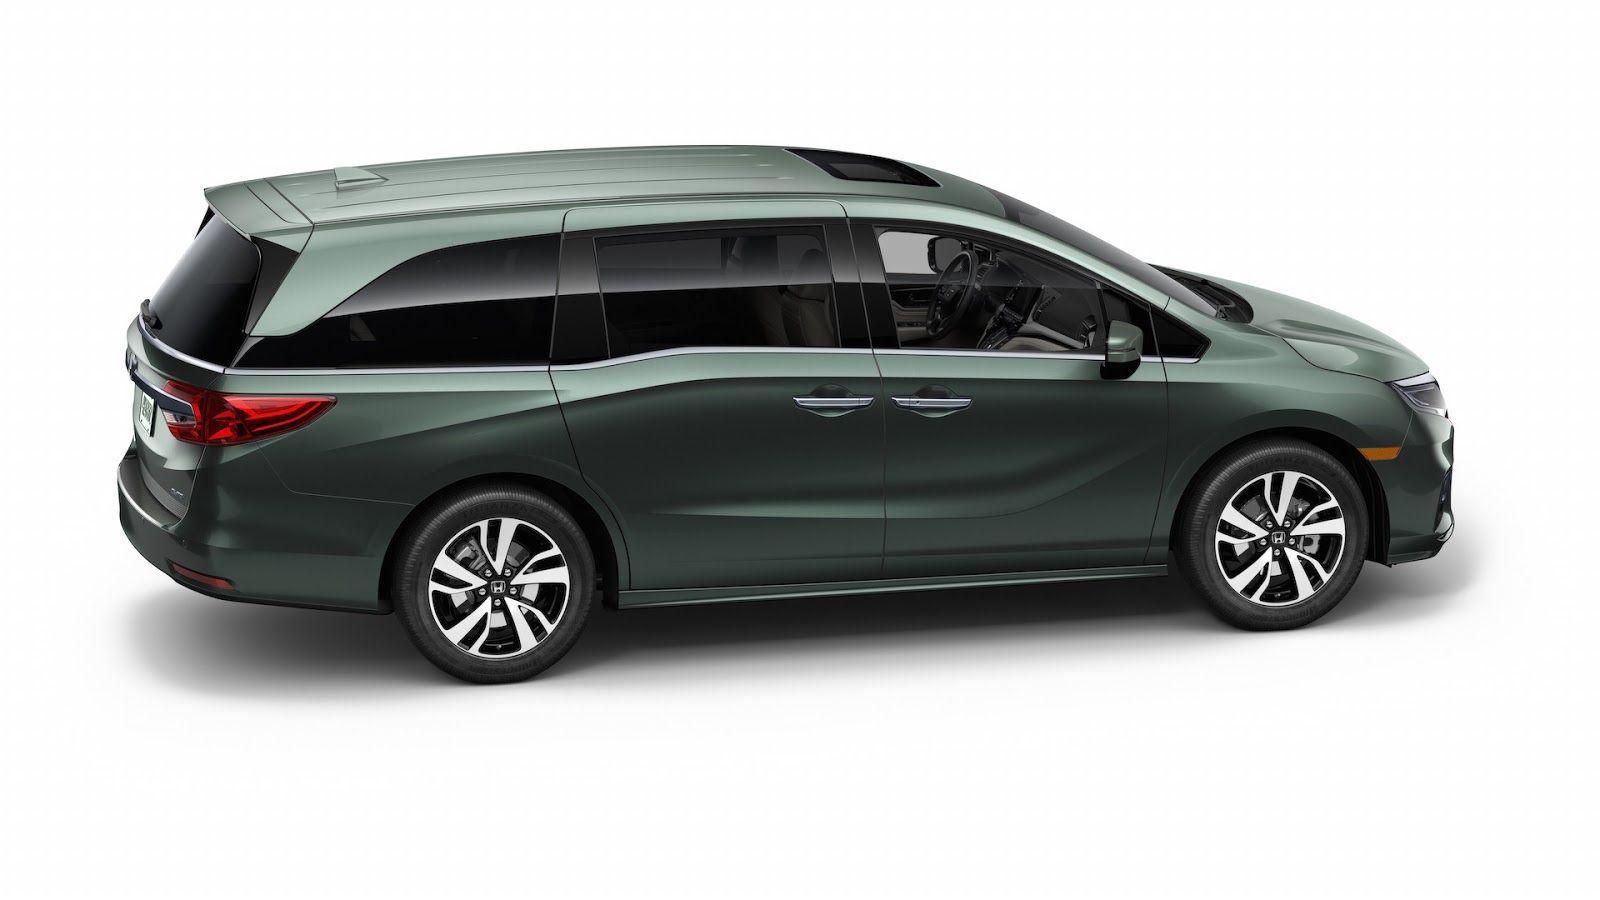 Honda s all new 2018 odyssey minivan arrives in detroit